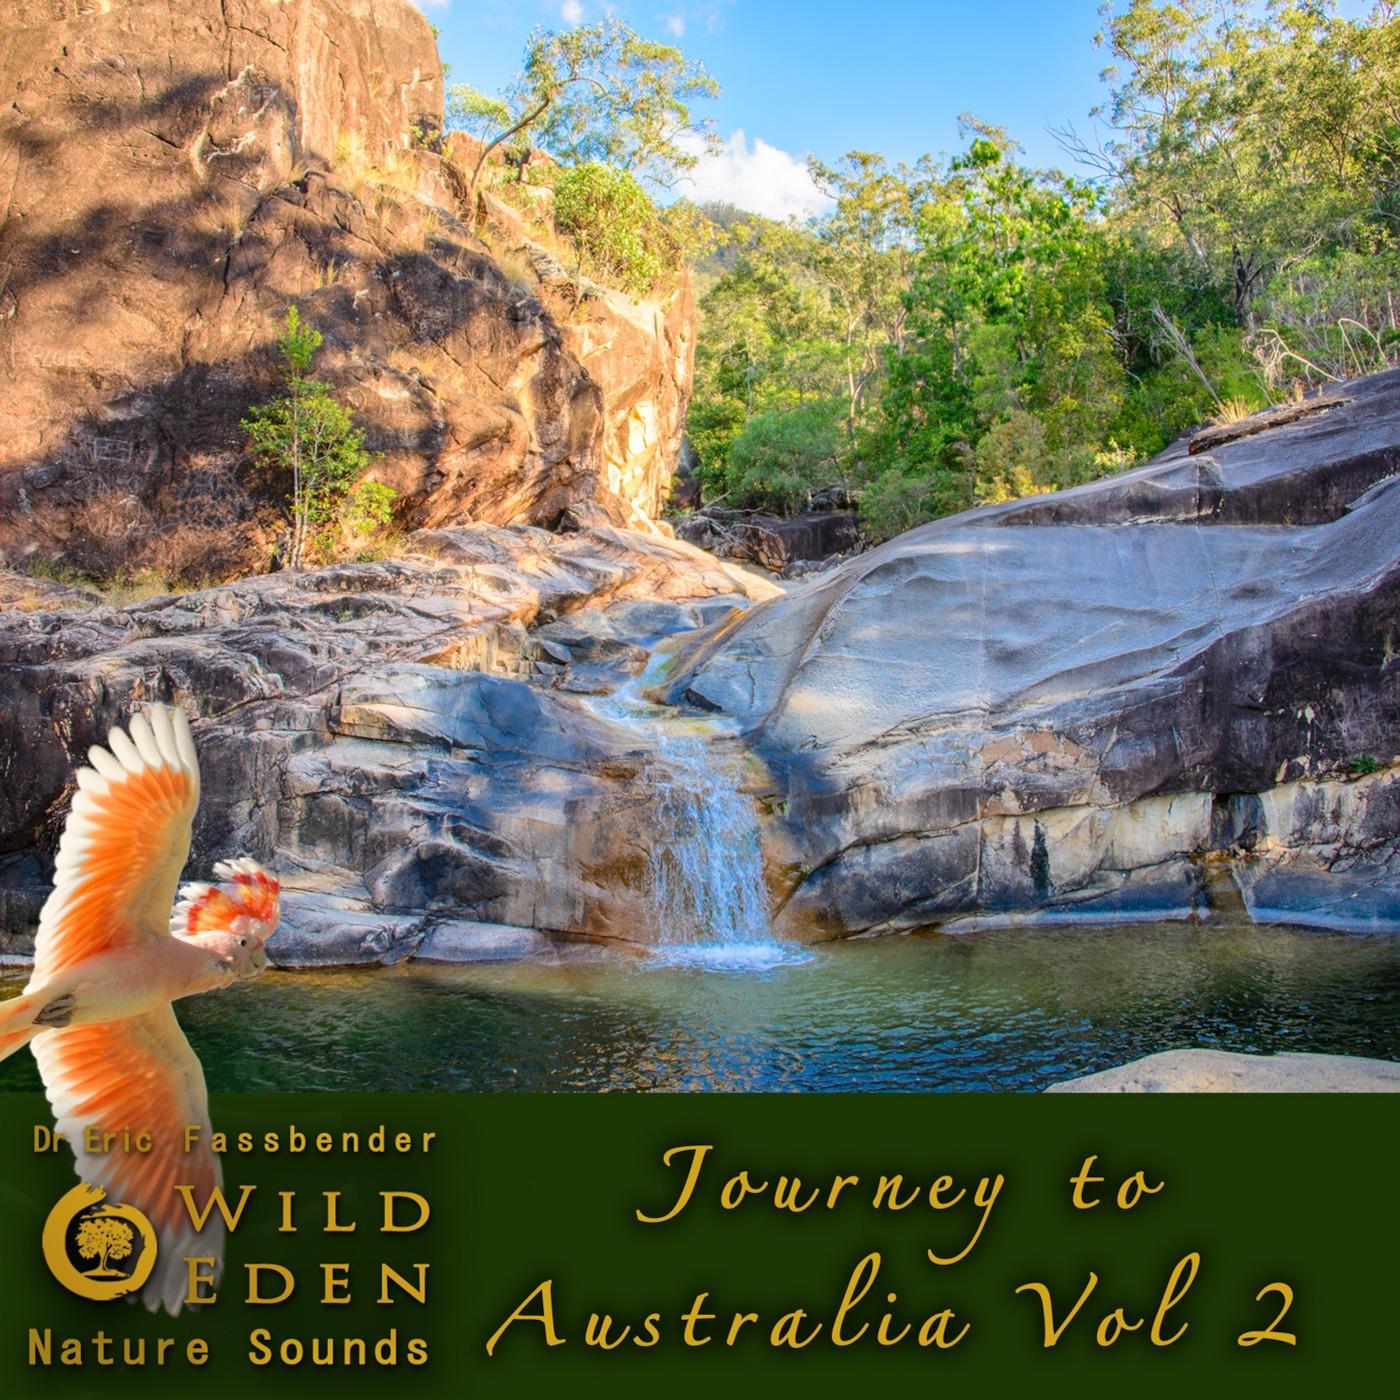 Episode 20 - A Walk in the Woods - Album Journey to Australia - Vol. 2